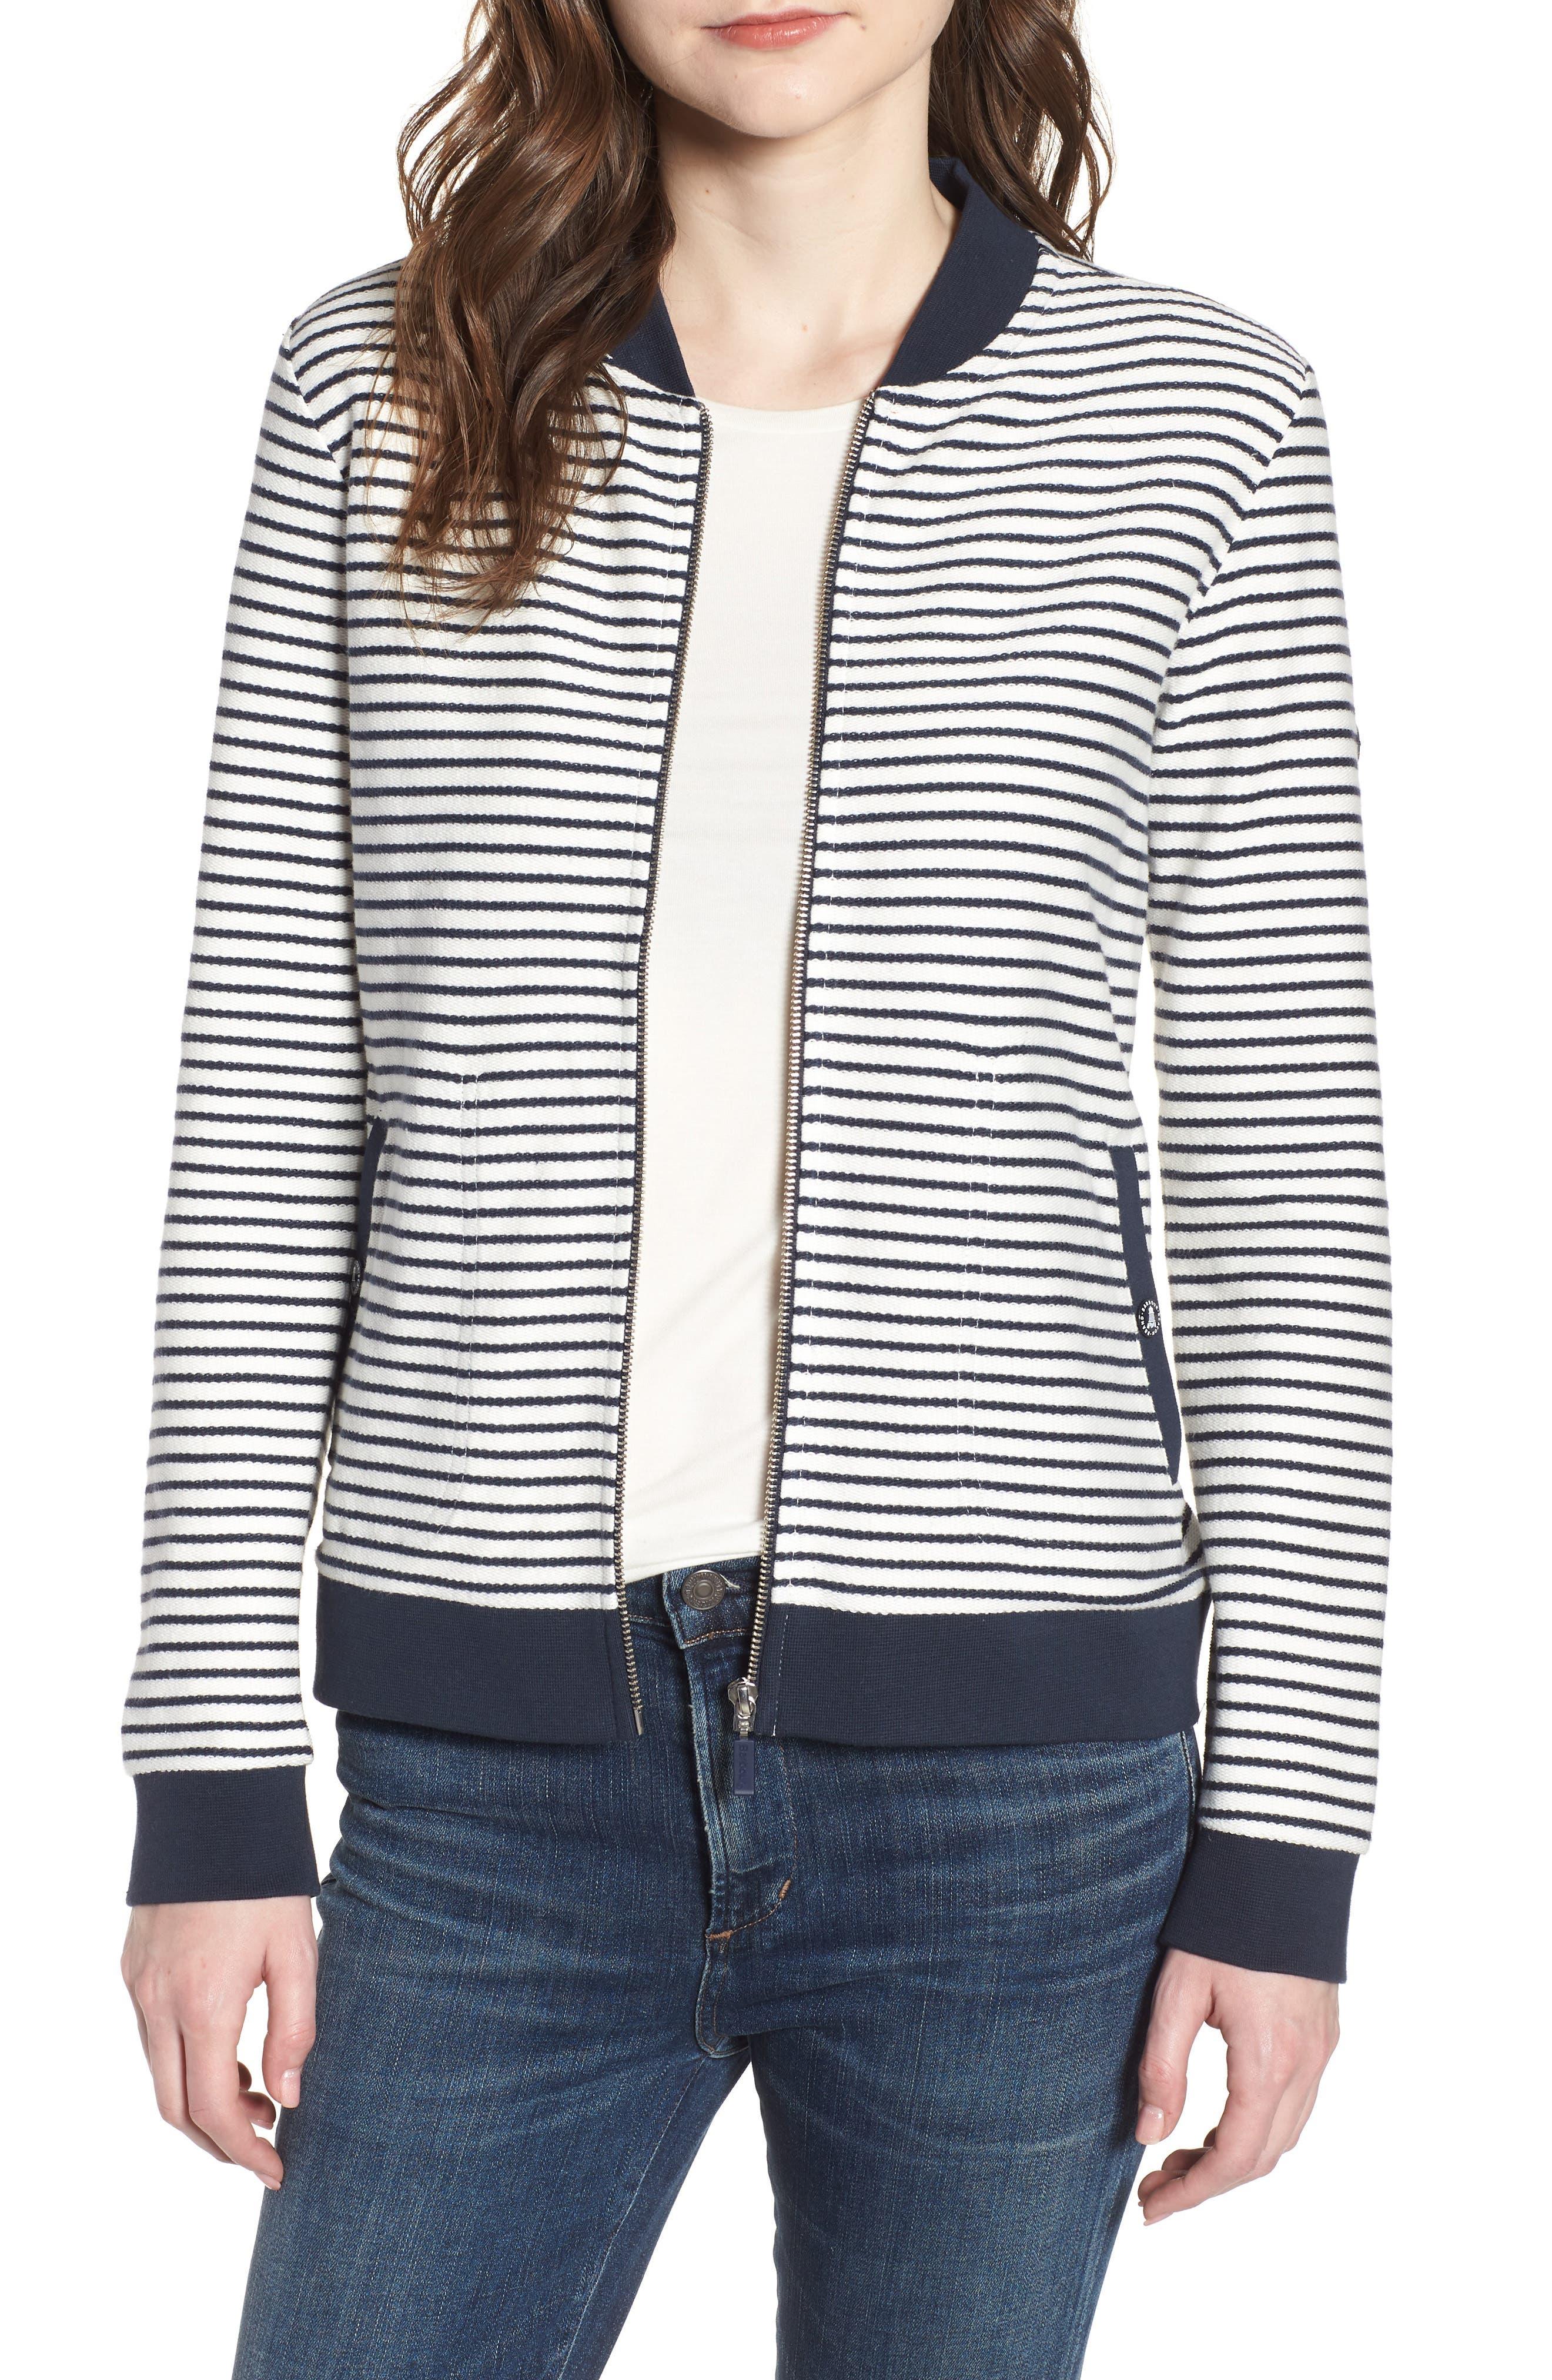 Bamburgh Sweater Jacket,                             Main thumbnail 1, color,                             White/ Navy